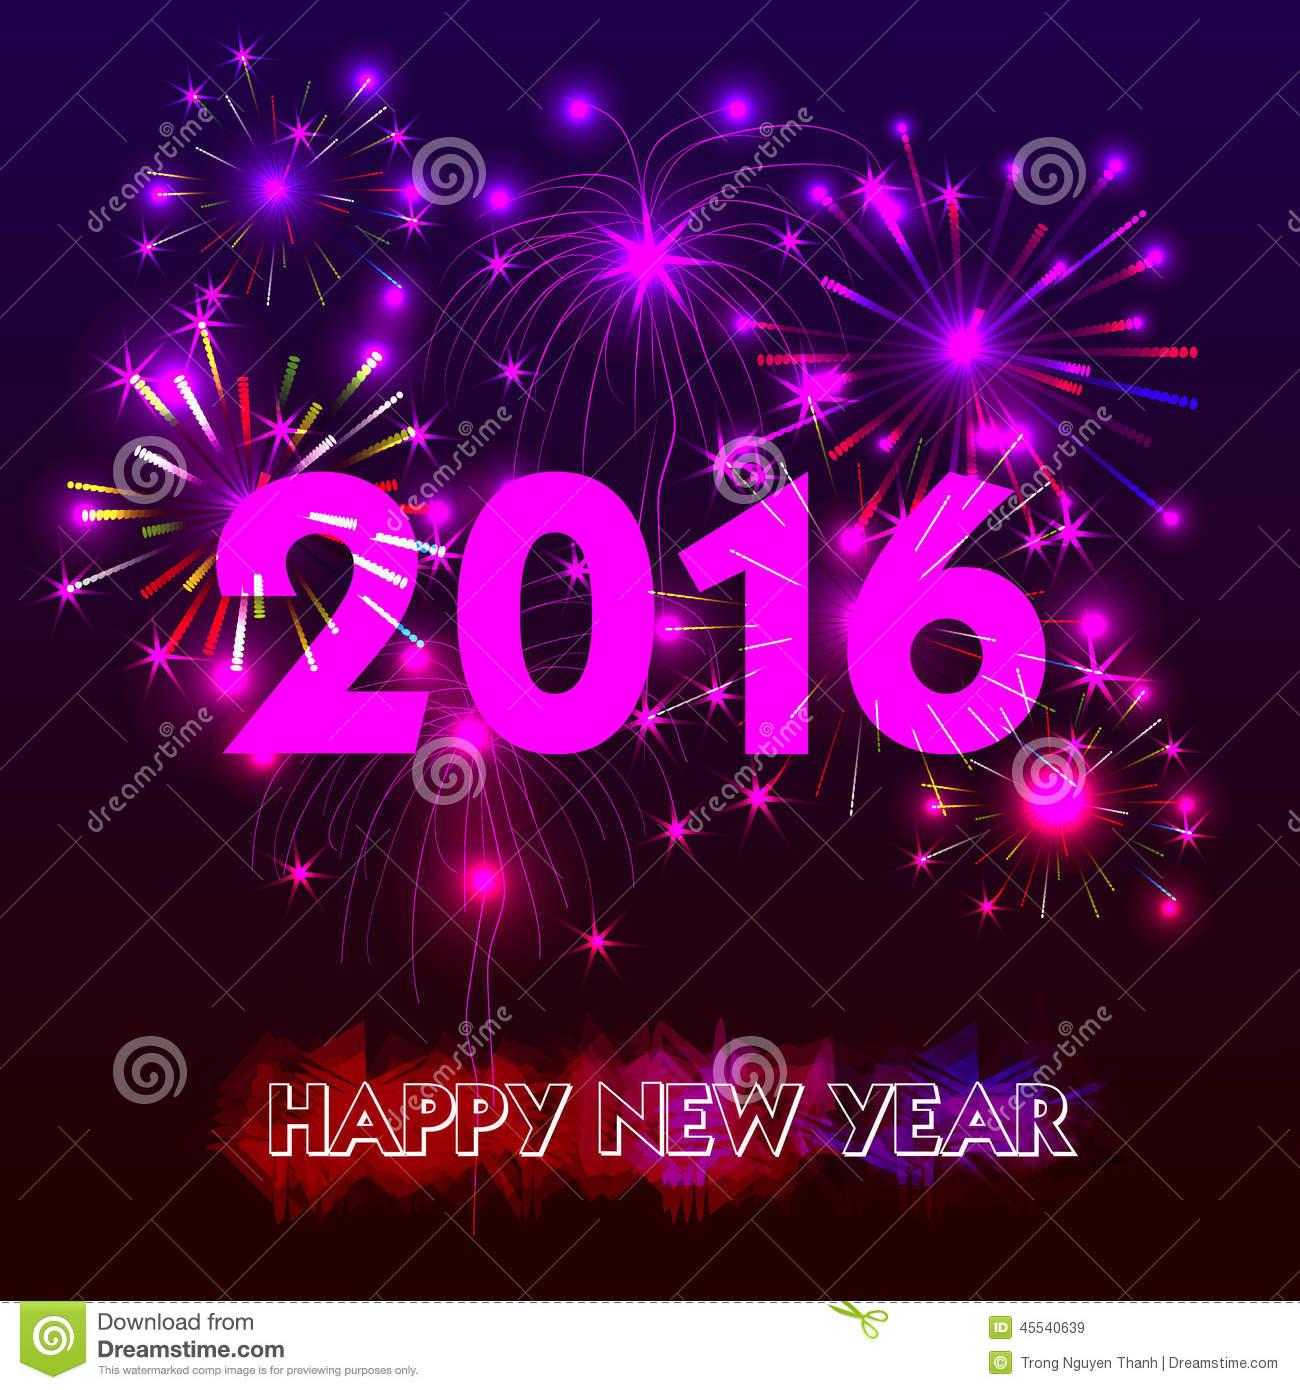 Happy New Year 2016 Image Wallpaper 17178 Wallpaper computer 1300x1390